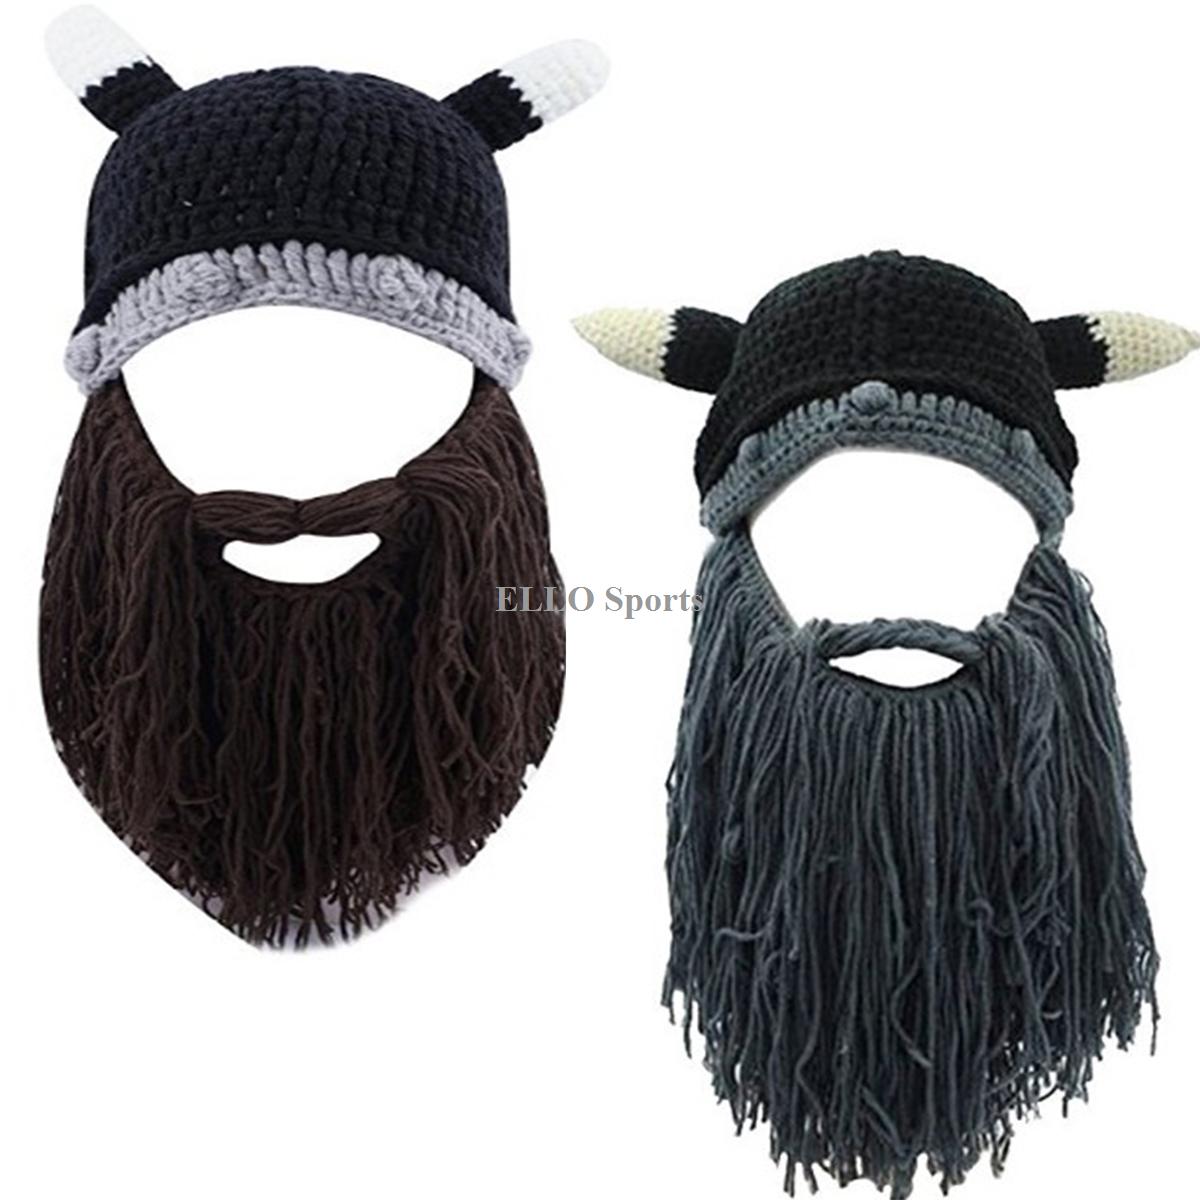 Men Women Winter Barbarian Viking Pirate Beard Mustache Beanie Knit Hat  Mask Cap - Pirate Beard PNG